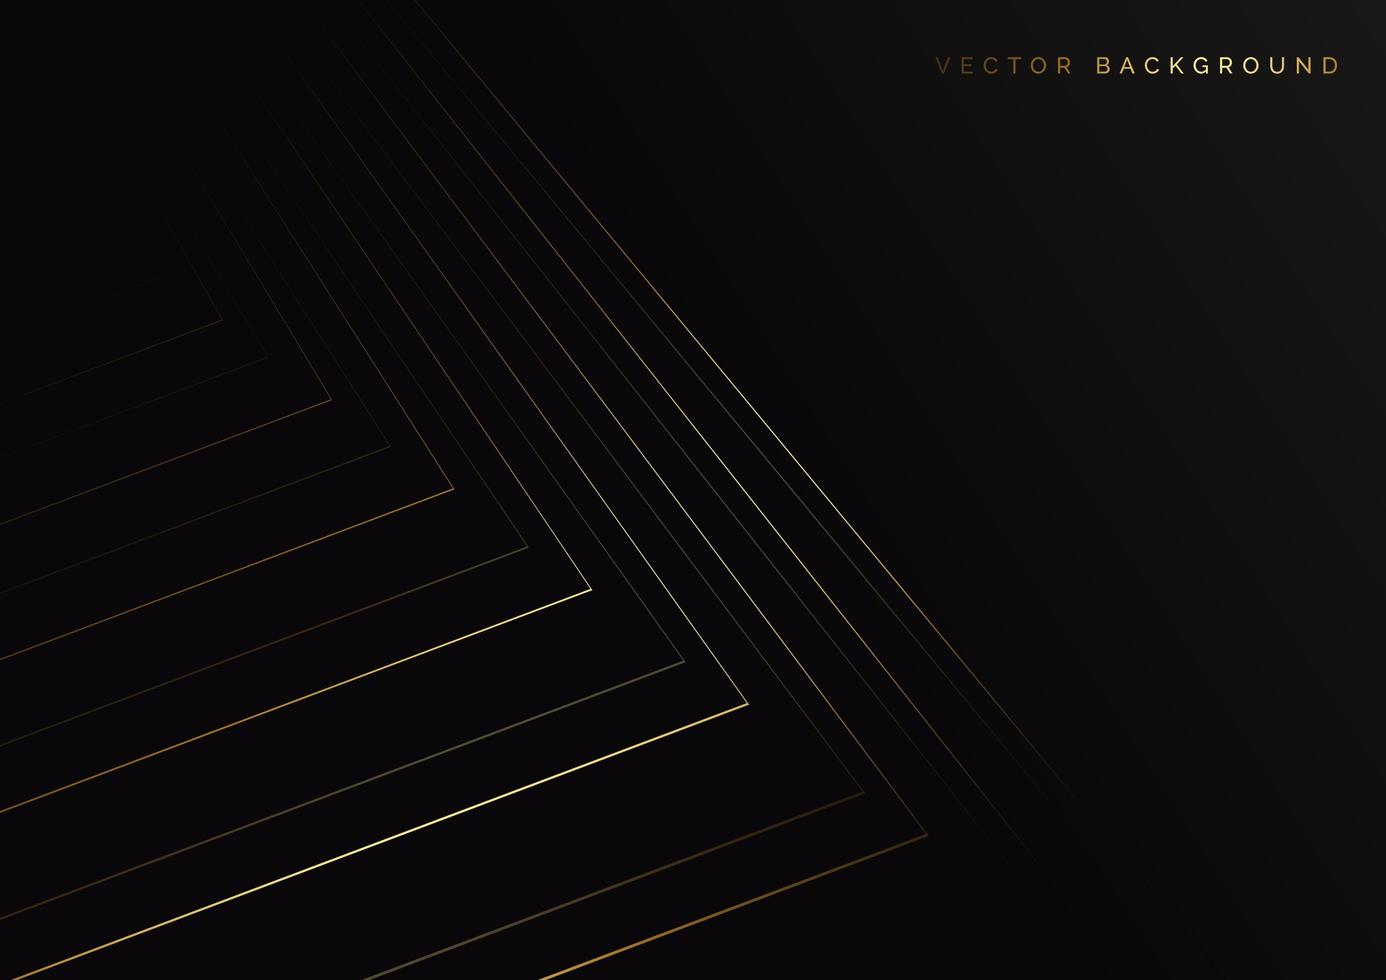 abstrakte Streifen goldene Linien vektor